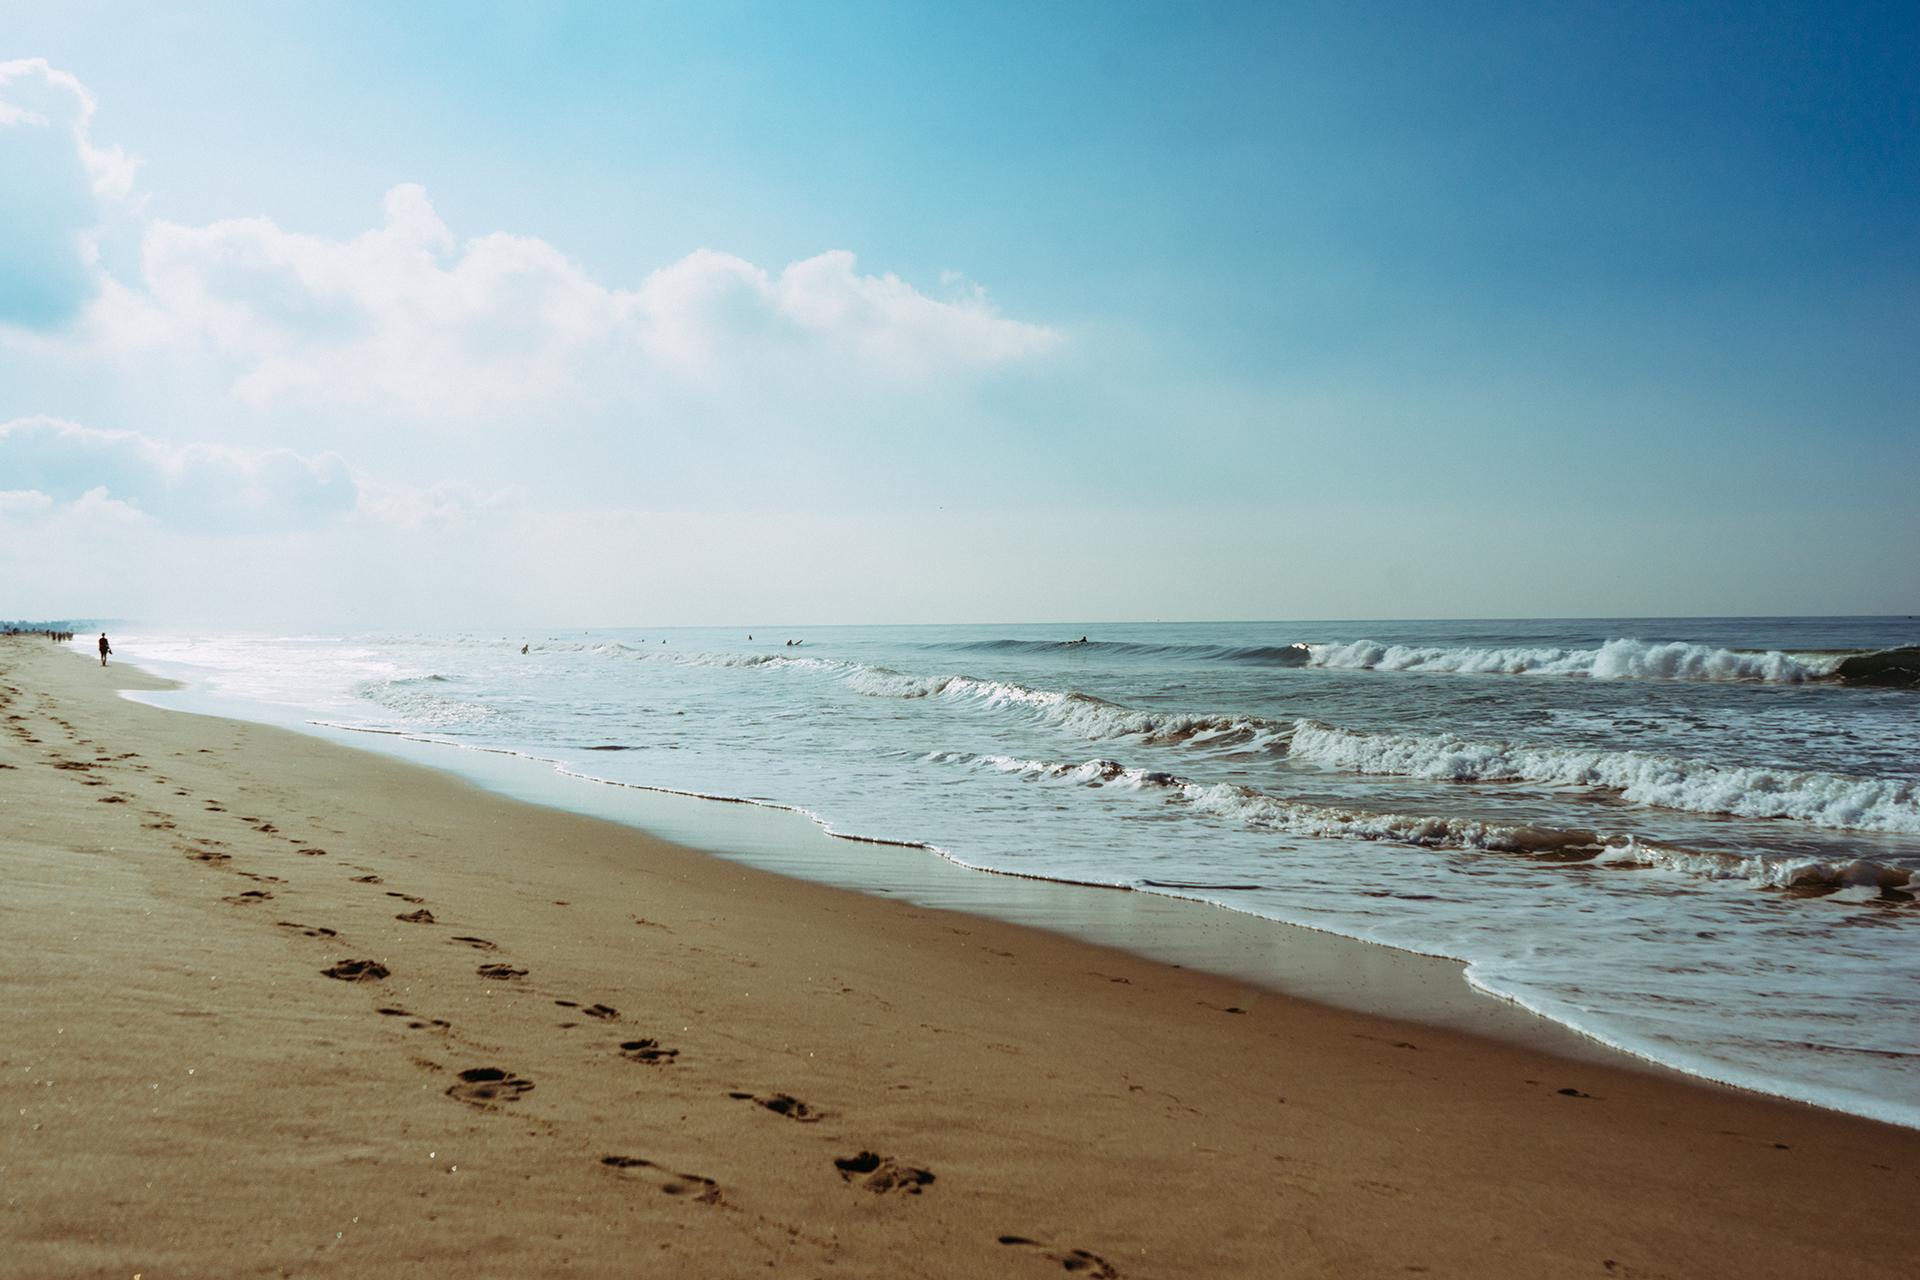 sea-beach-footprint-steps